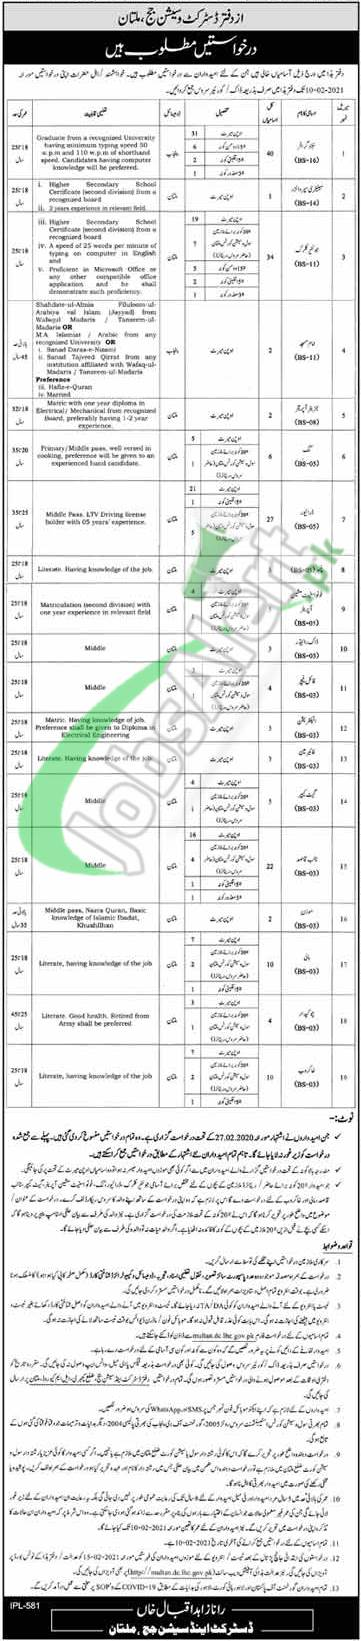 Session Court Multan Jobs